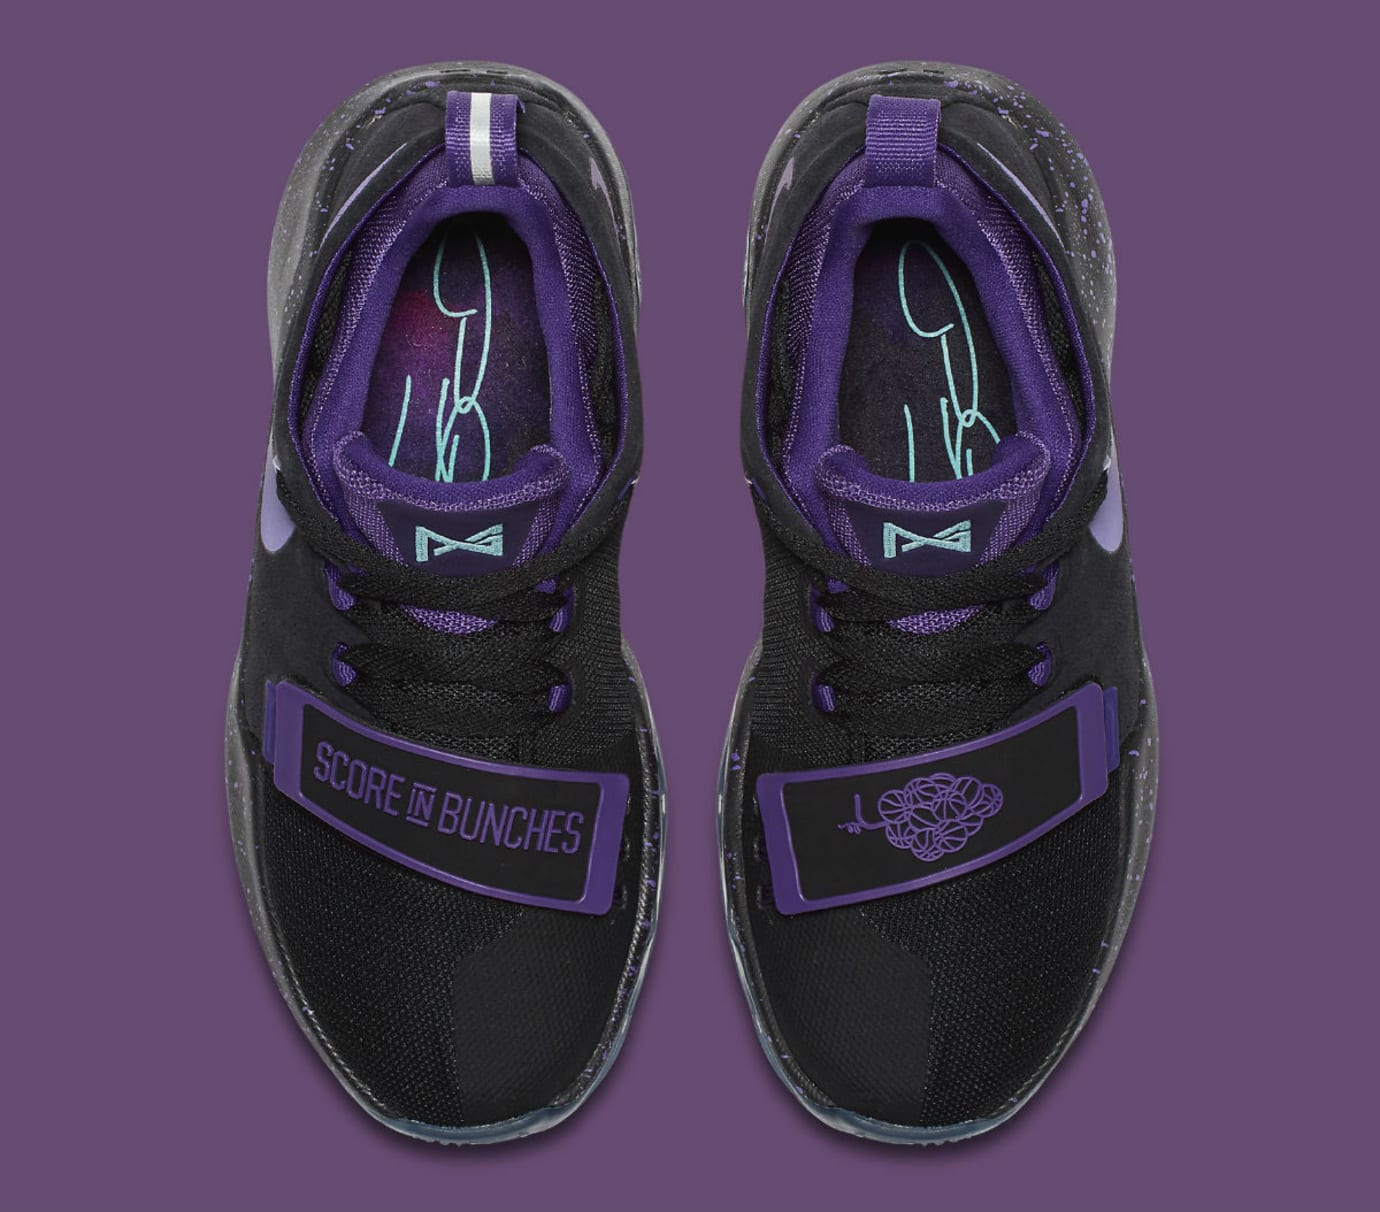 bef3295940ce Nike PG1 Gradeschool Grape Release Date Top 880304-097